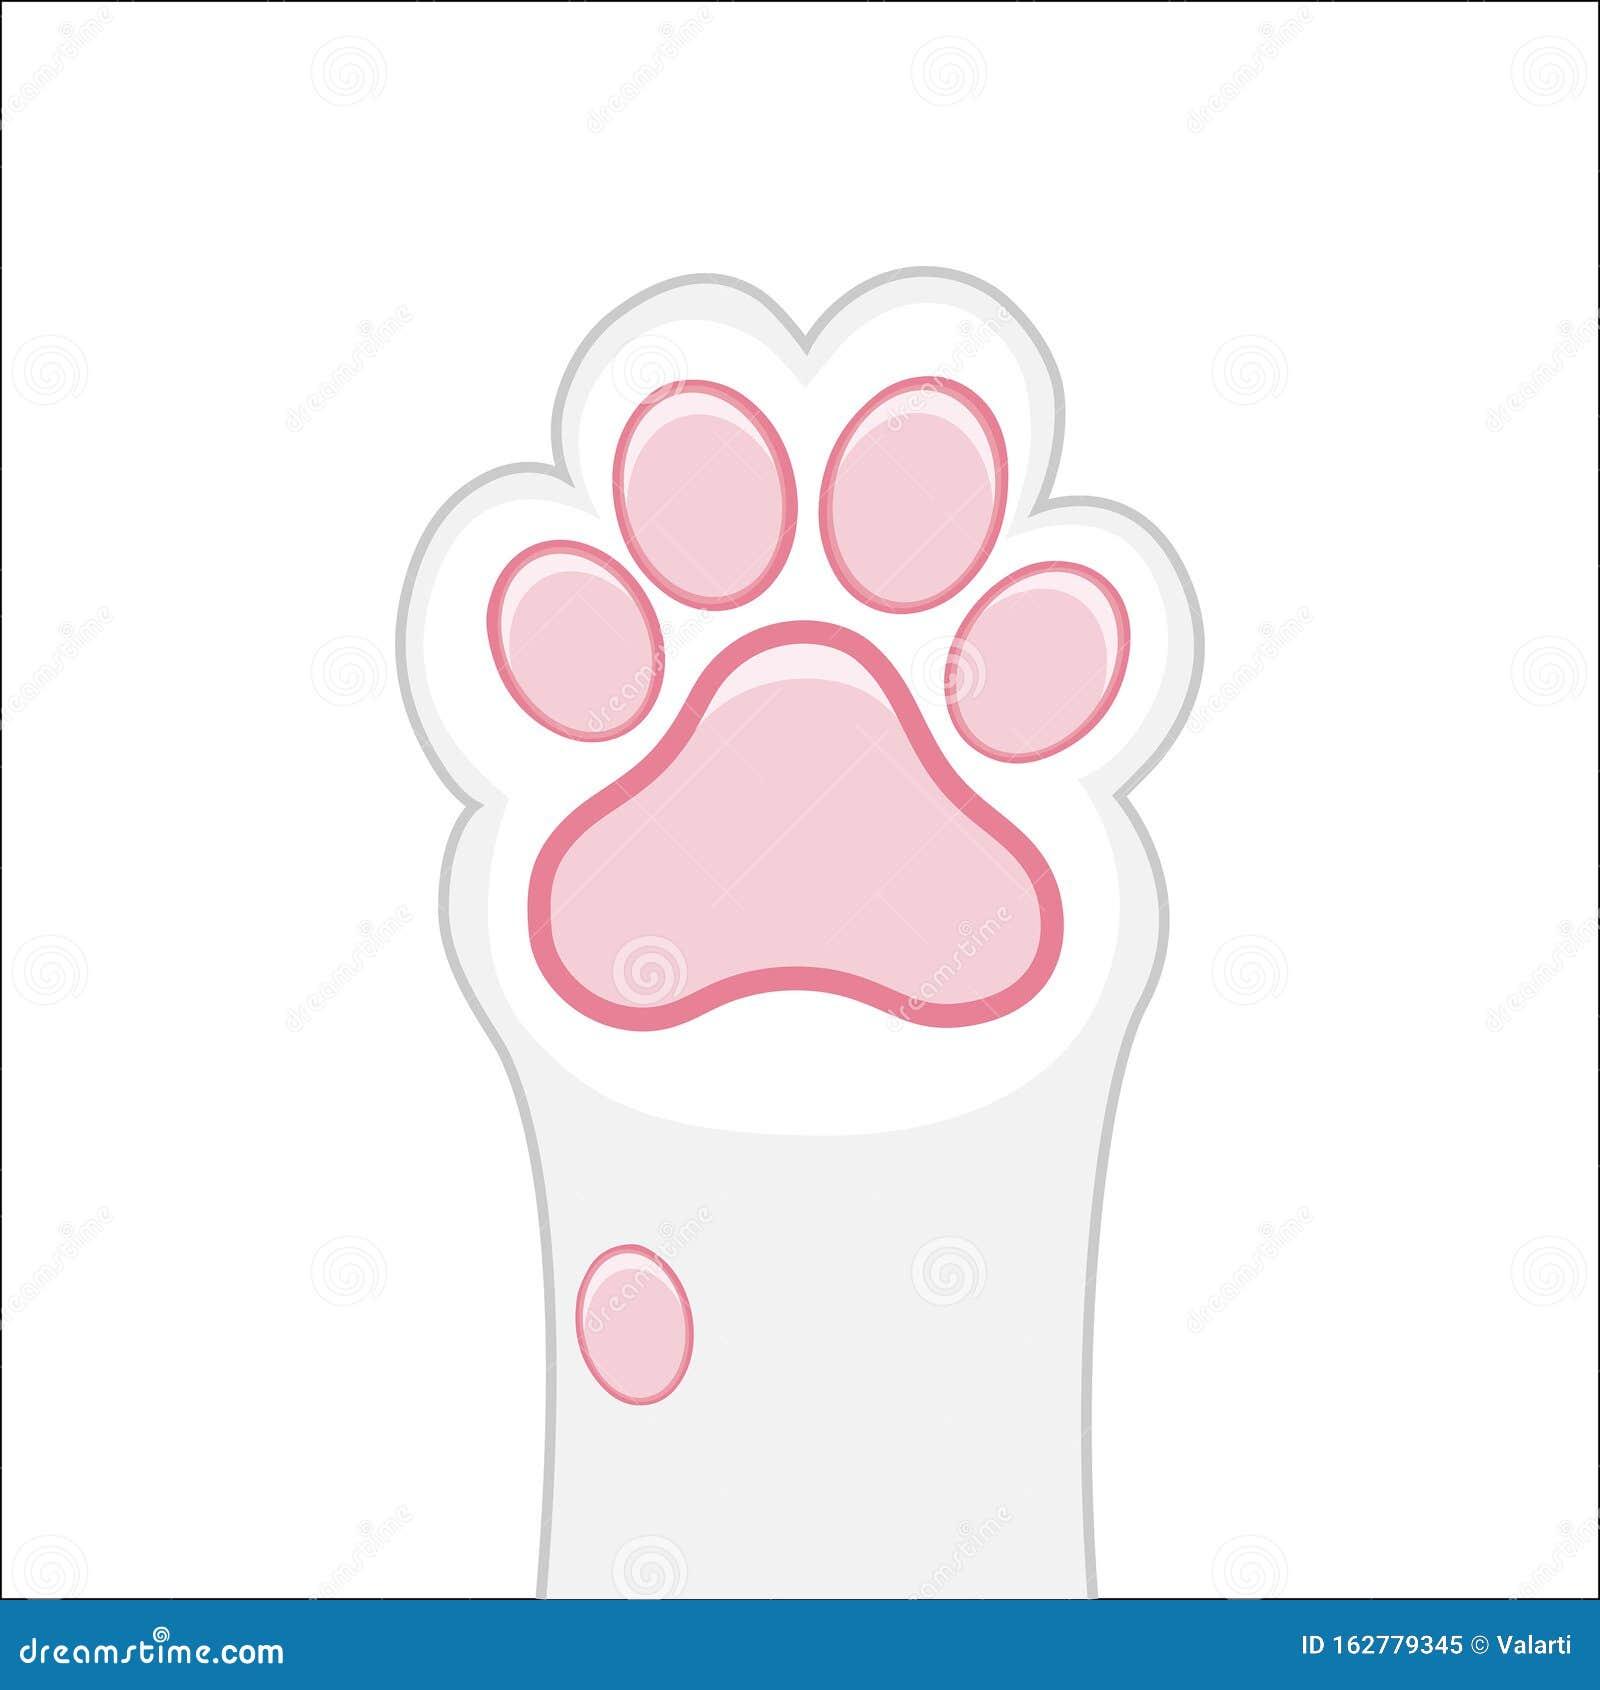 Cat Paw Background Kitten Flat Design Prints Cartoon Cute Cat Foot Wallpaper Vector Illustration Stock Vector Illustration Of Graphic Isolated 162779345